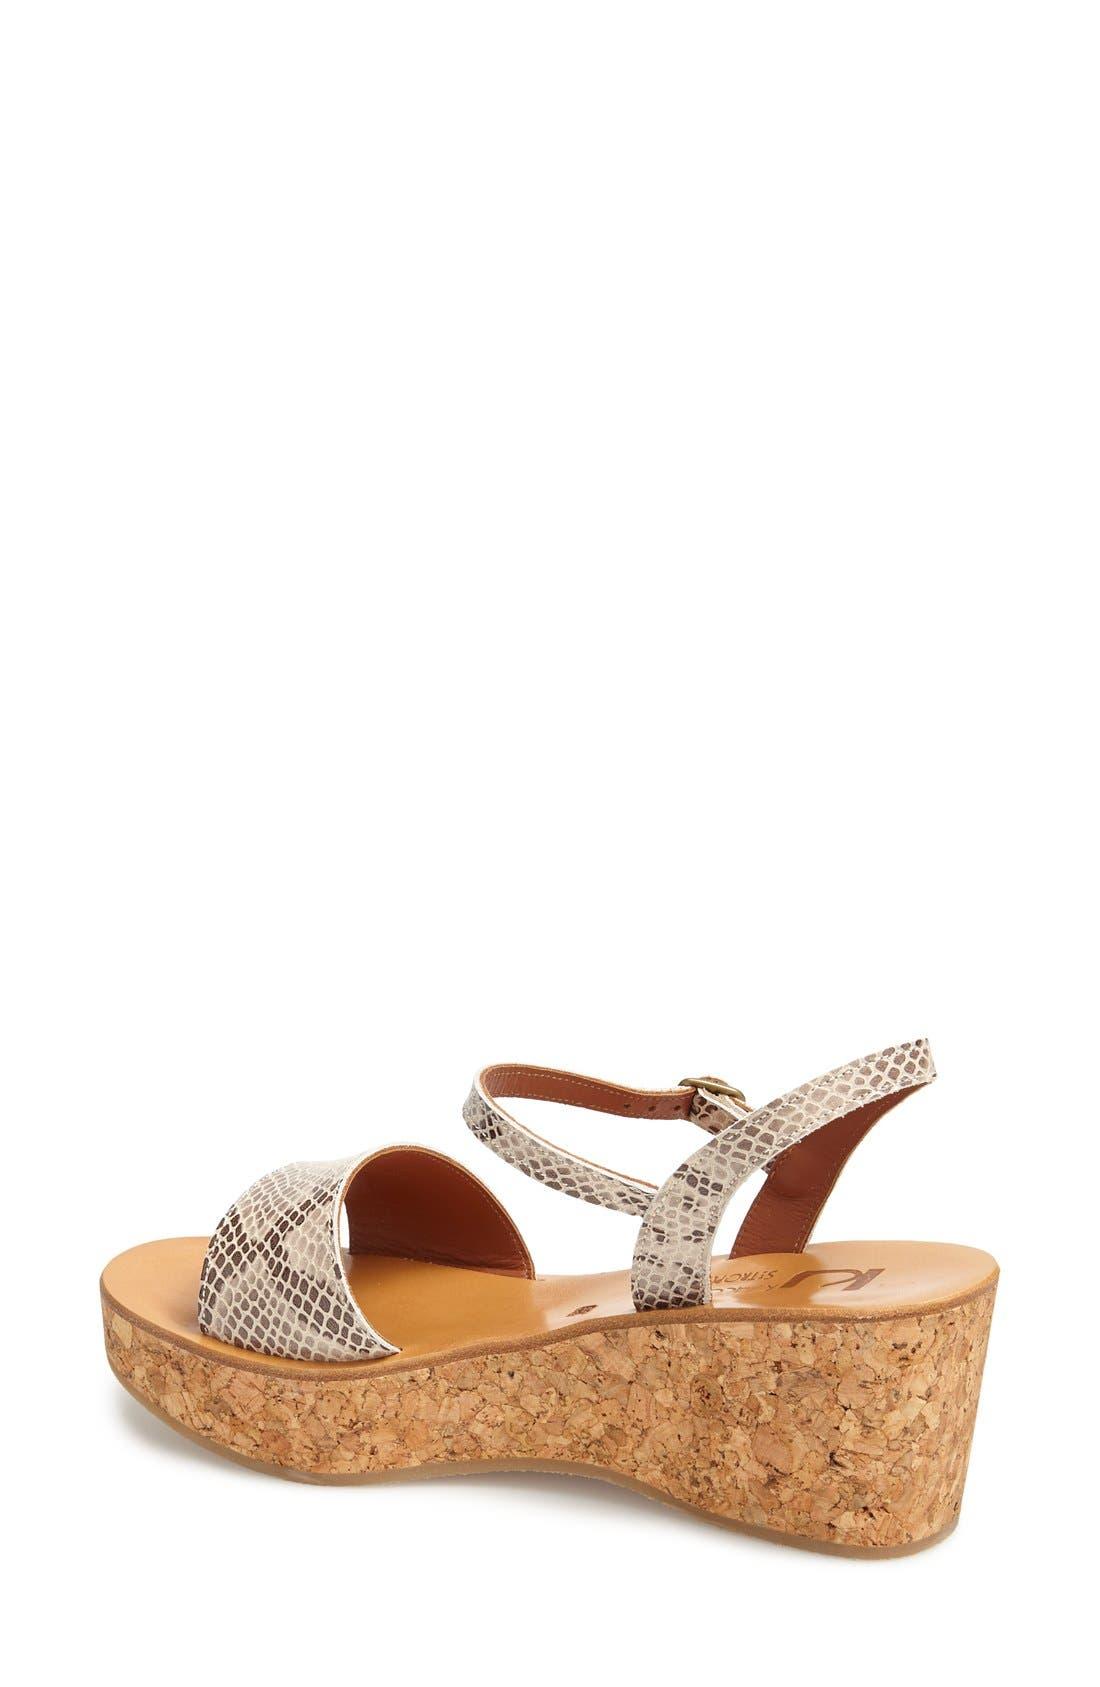 Alternate Image 2  - K.Jacques St. Tropez 'Josy' Ankle Strap Wedge Sandal (Women)